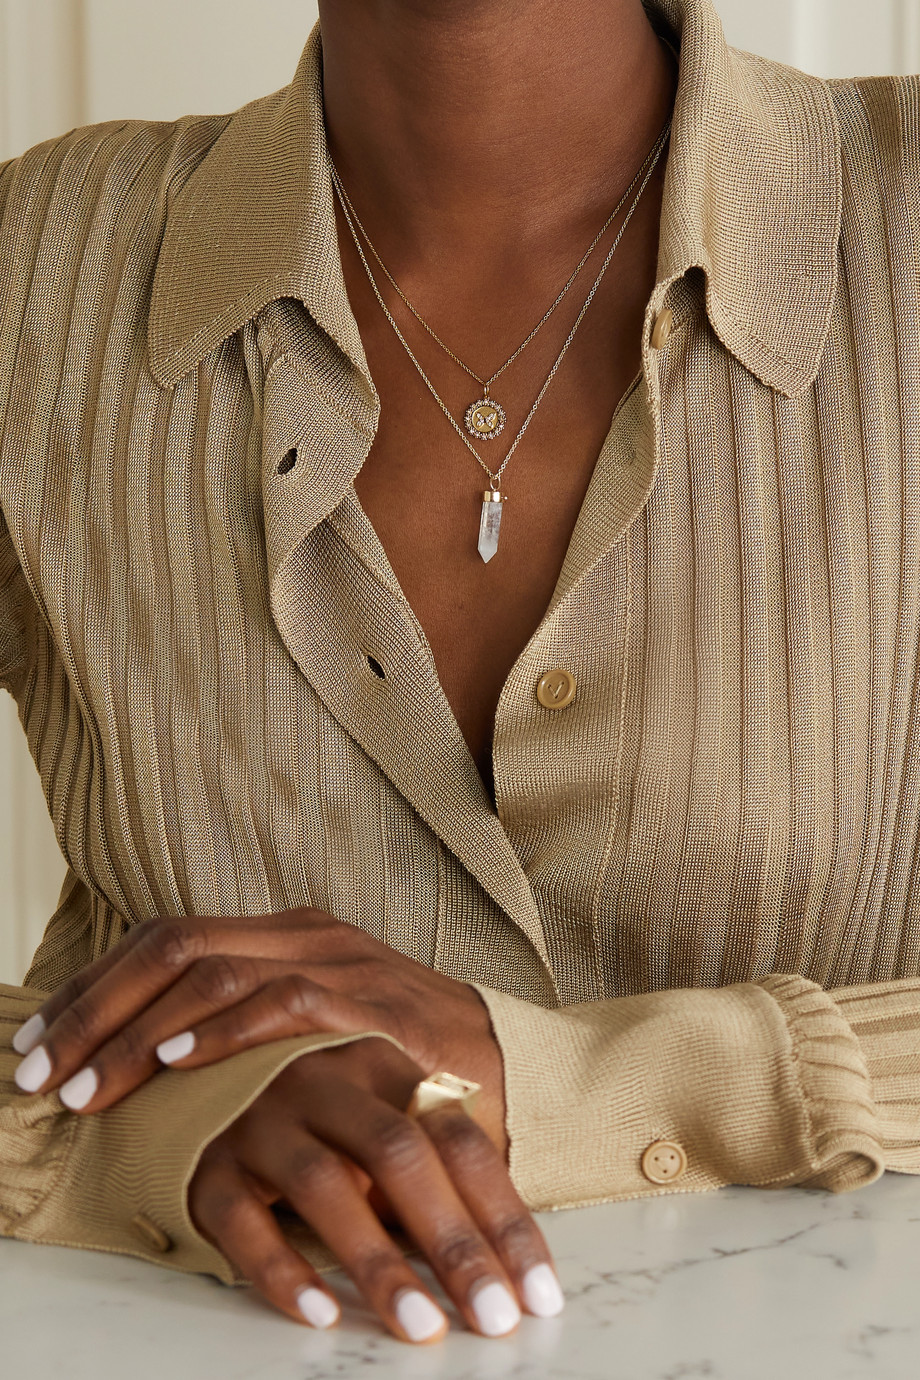 Sydney Evan Butterfly Coin 14-karat gold diamond necklace